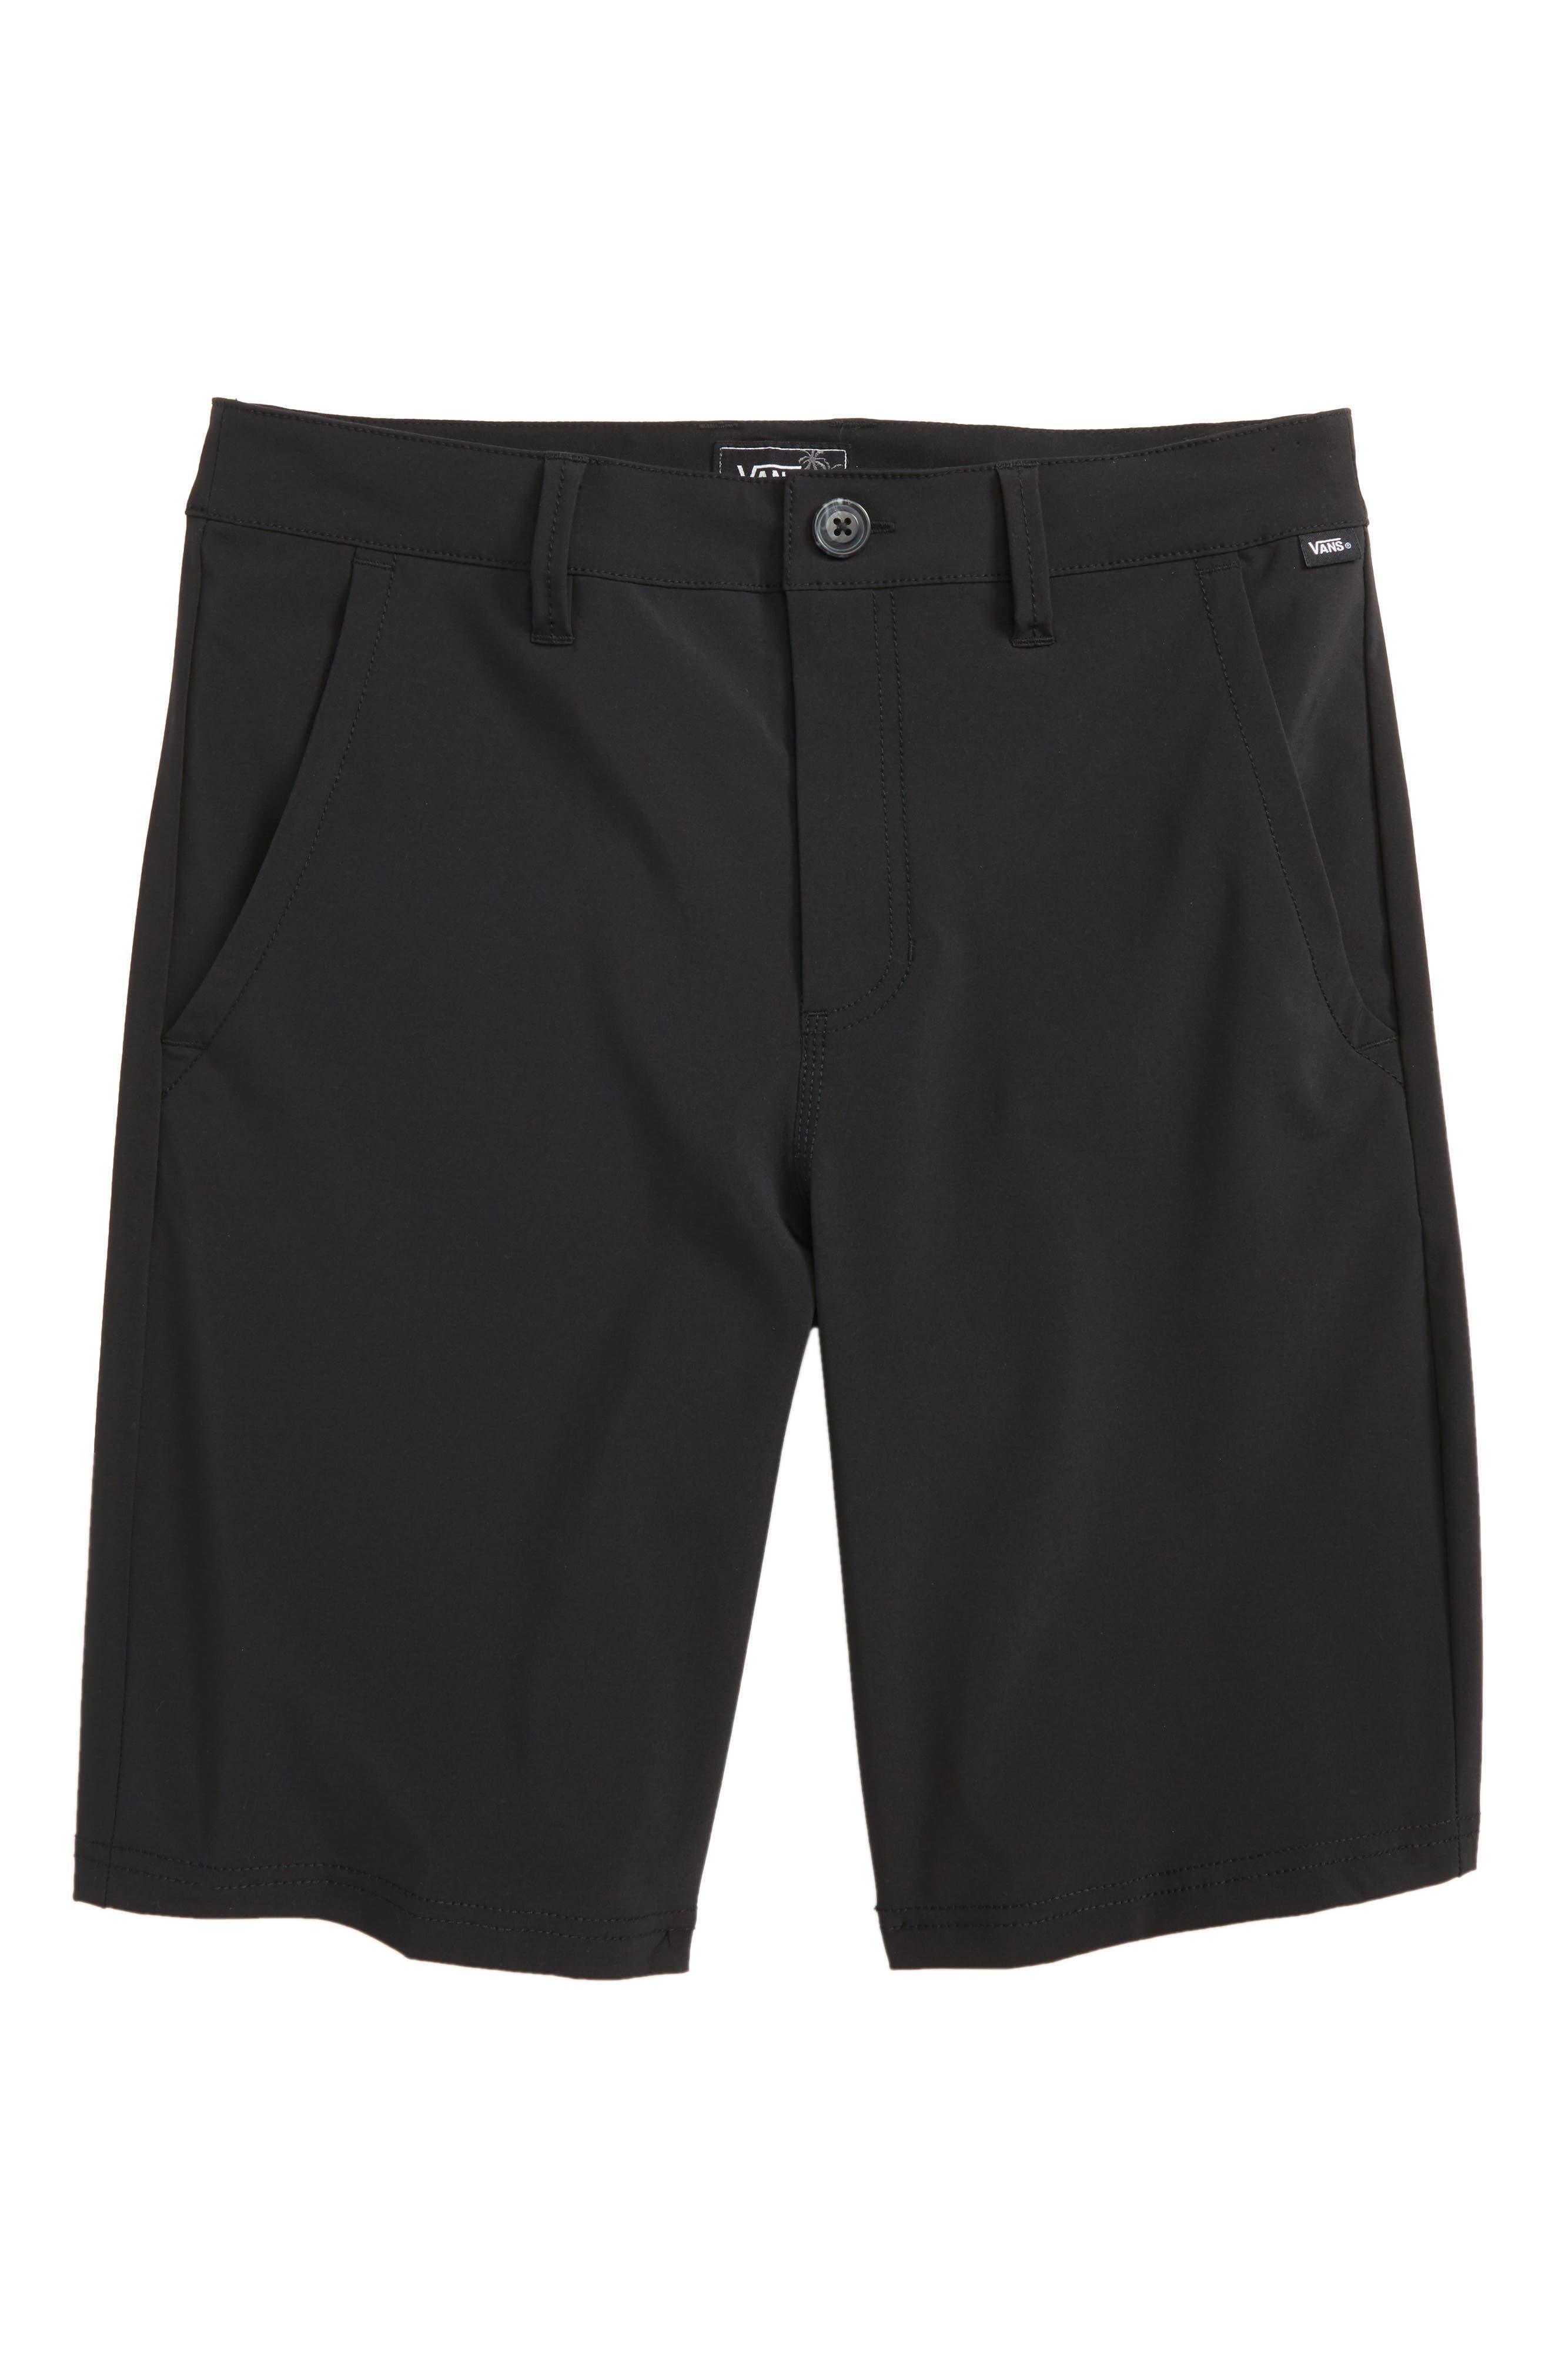 Authentic Decksider Hybrid Shorts,                         Main,                         color,